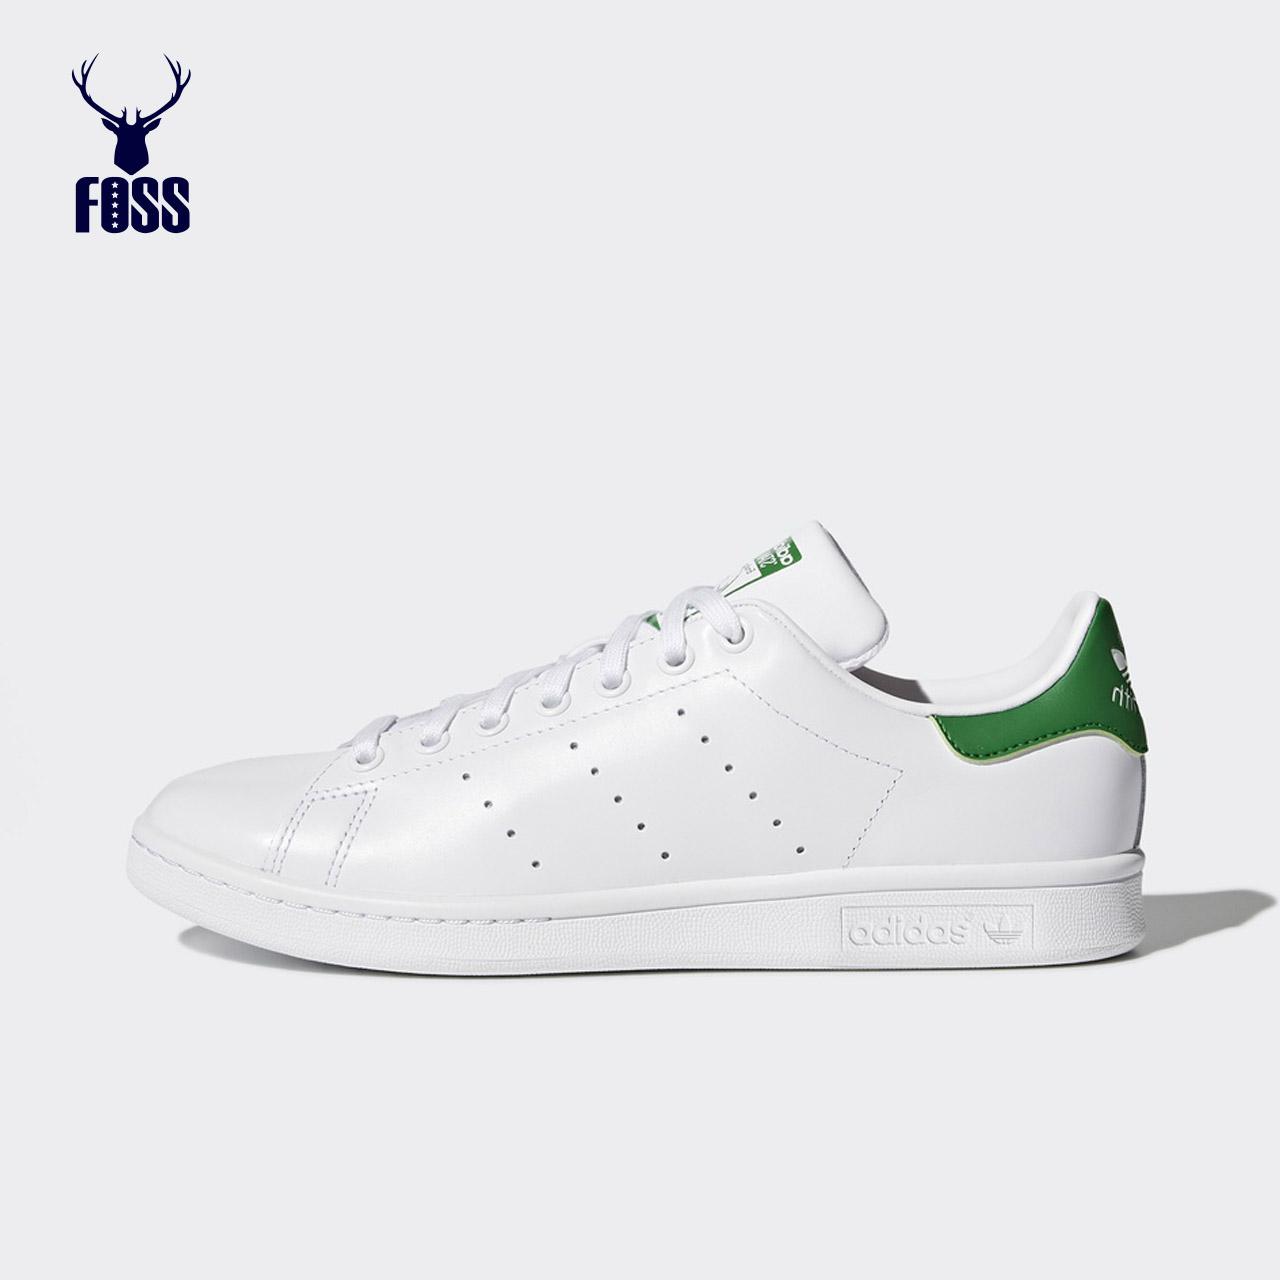 adidas 阿迪达斯 三叶草 Stan Smith 史密斯绿尾板鞋M20324